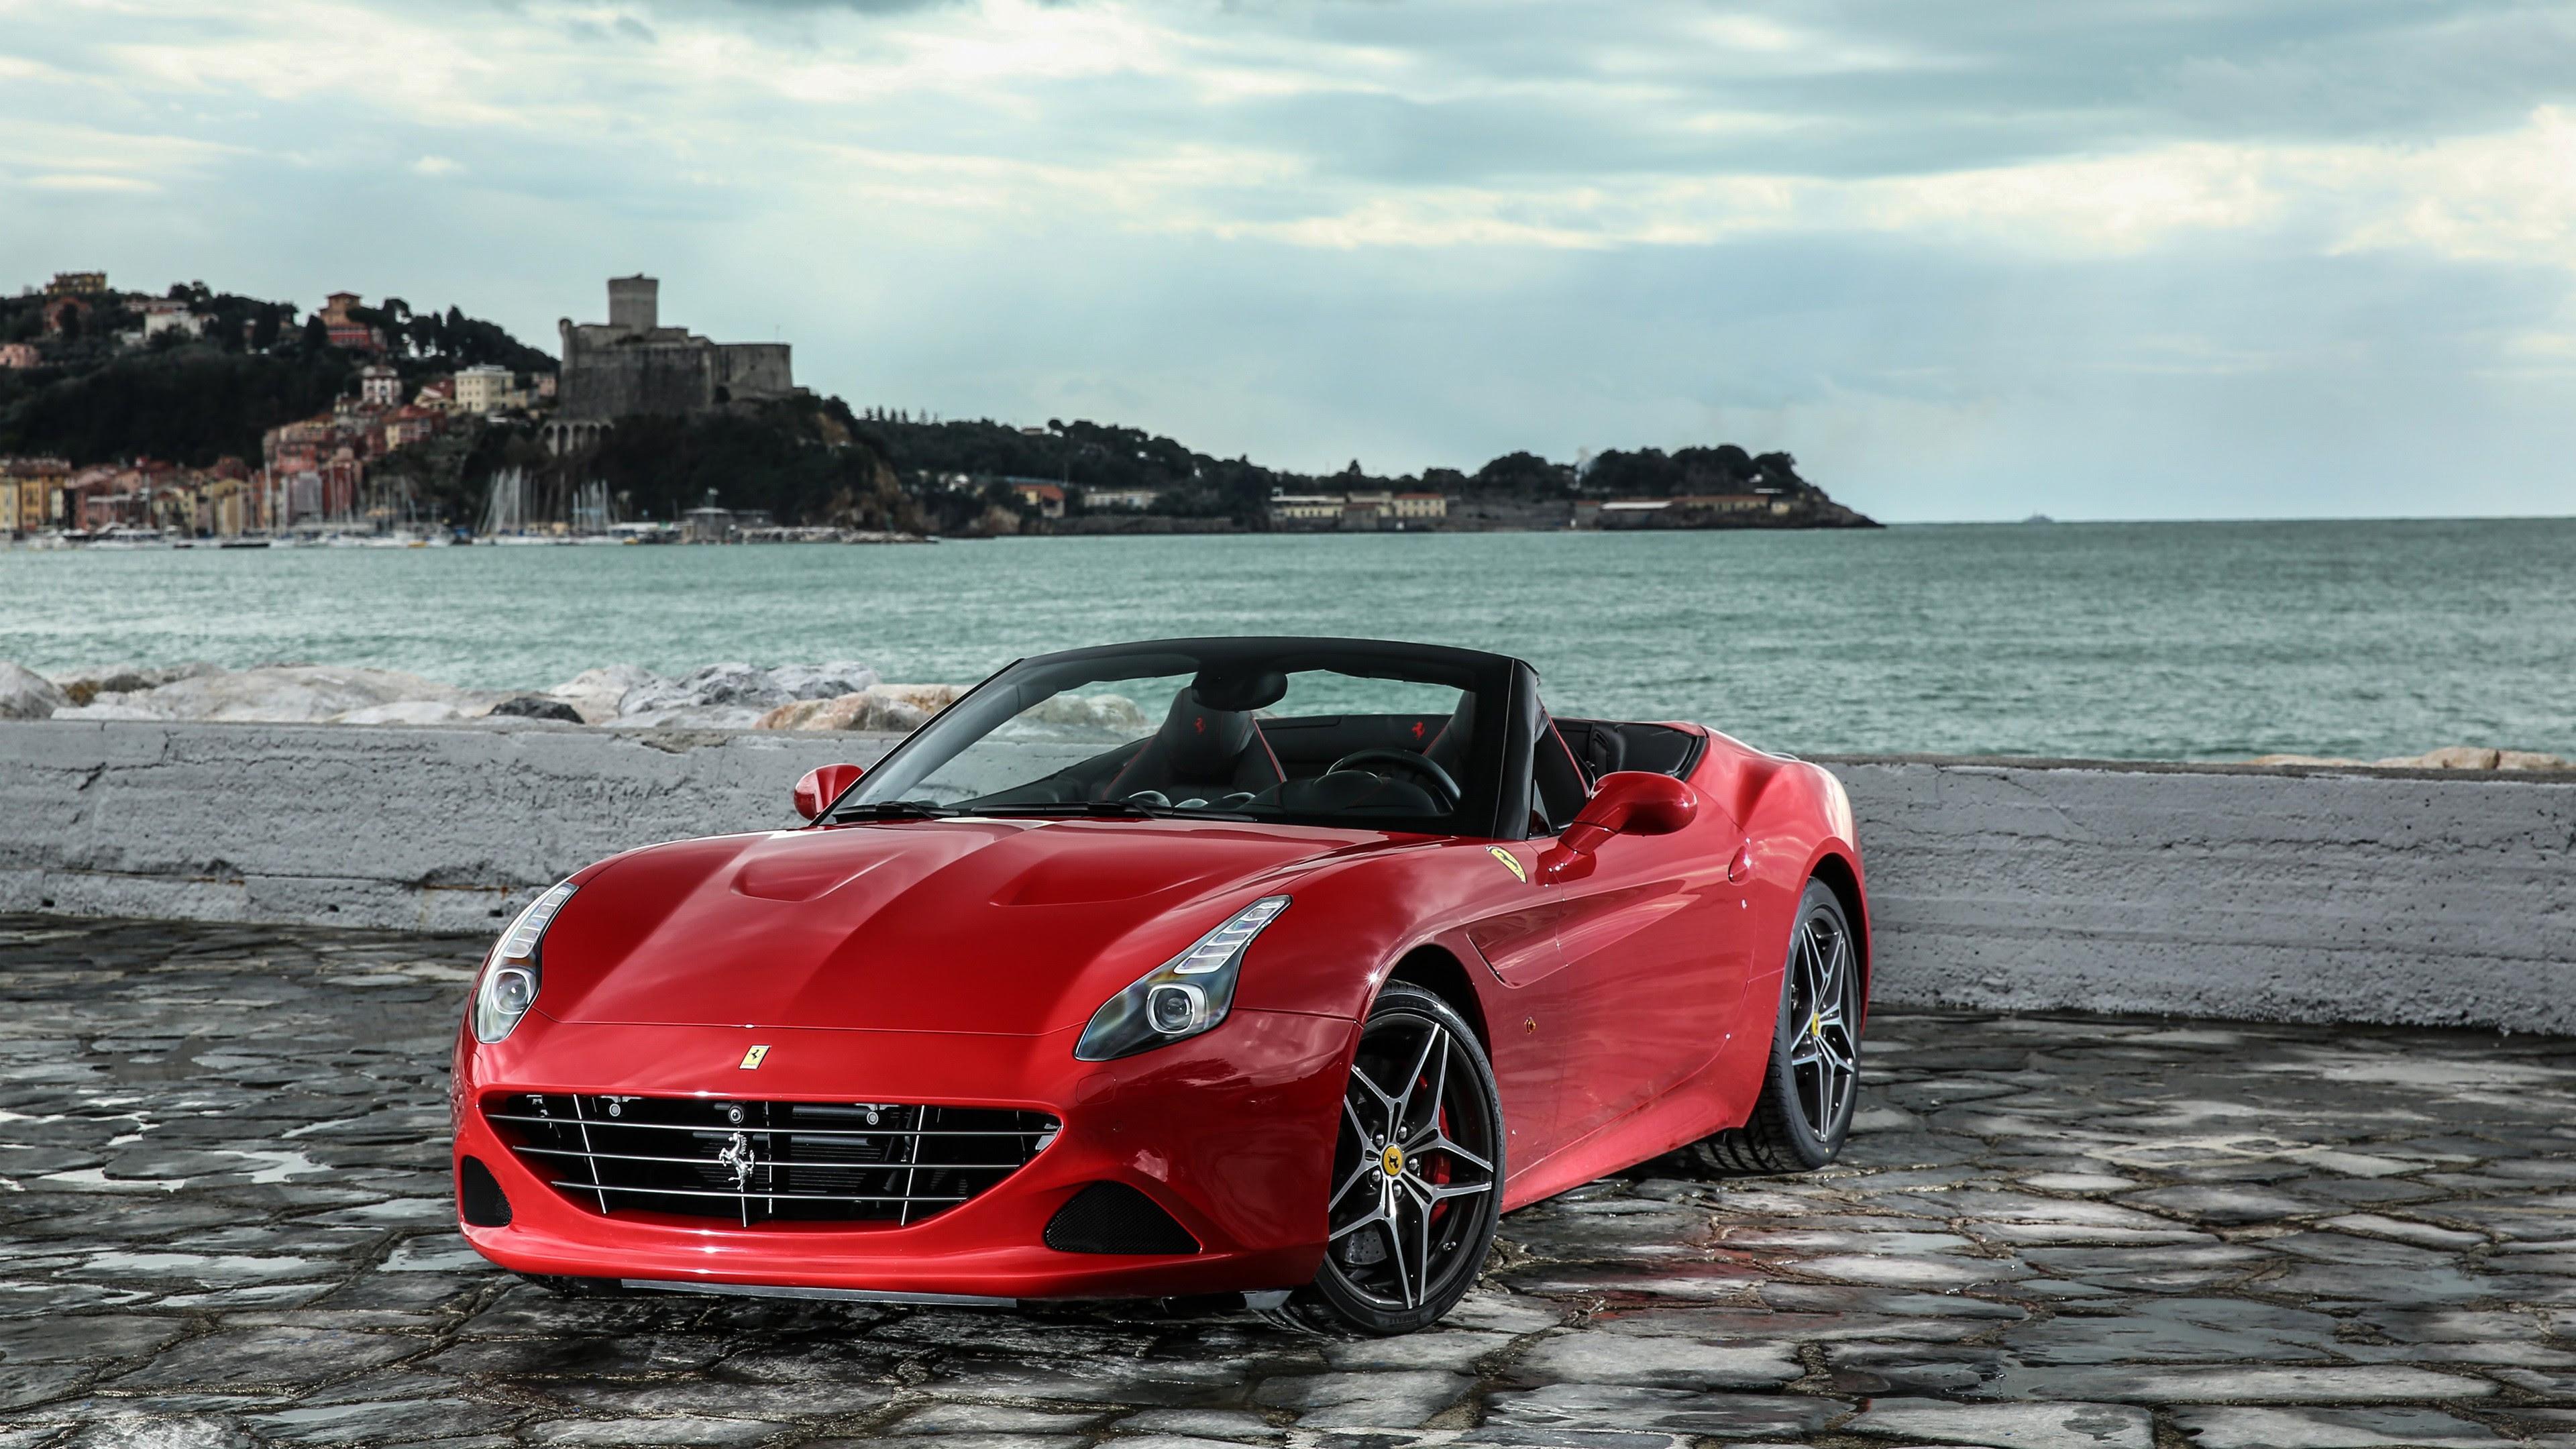 2016 Ferrari California T HS Wallpaper | HD Car Wallpapers ...